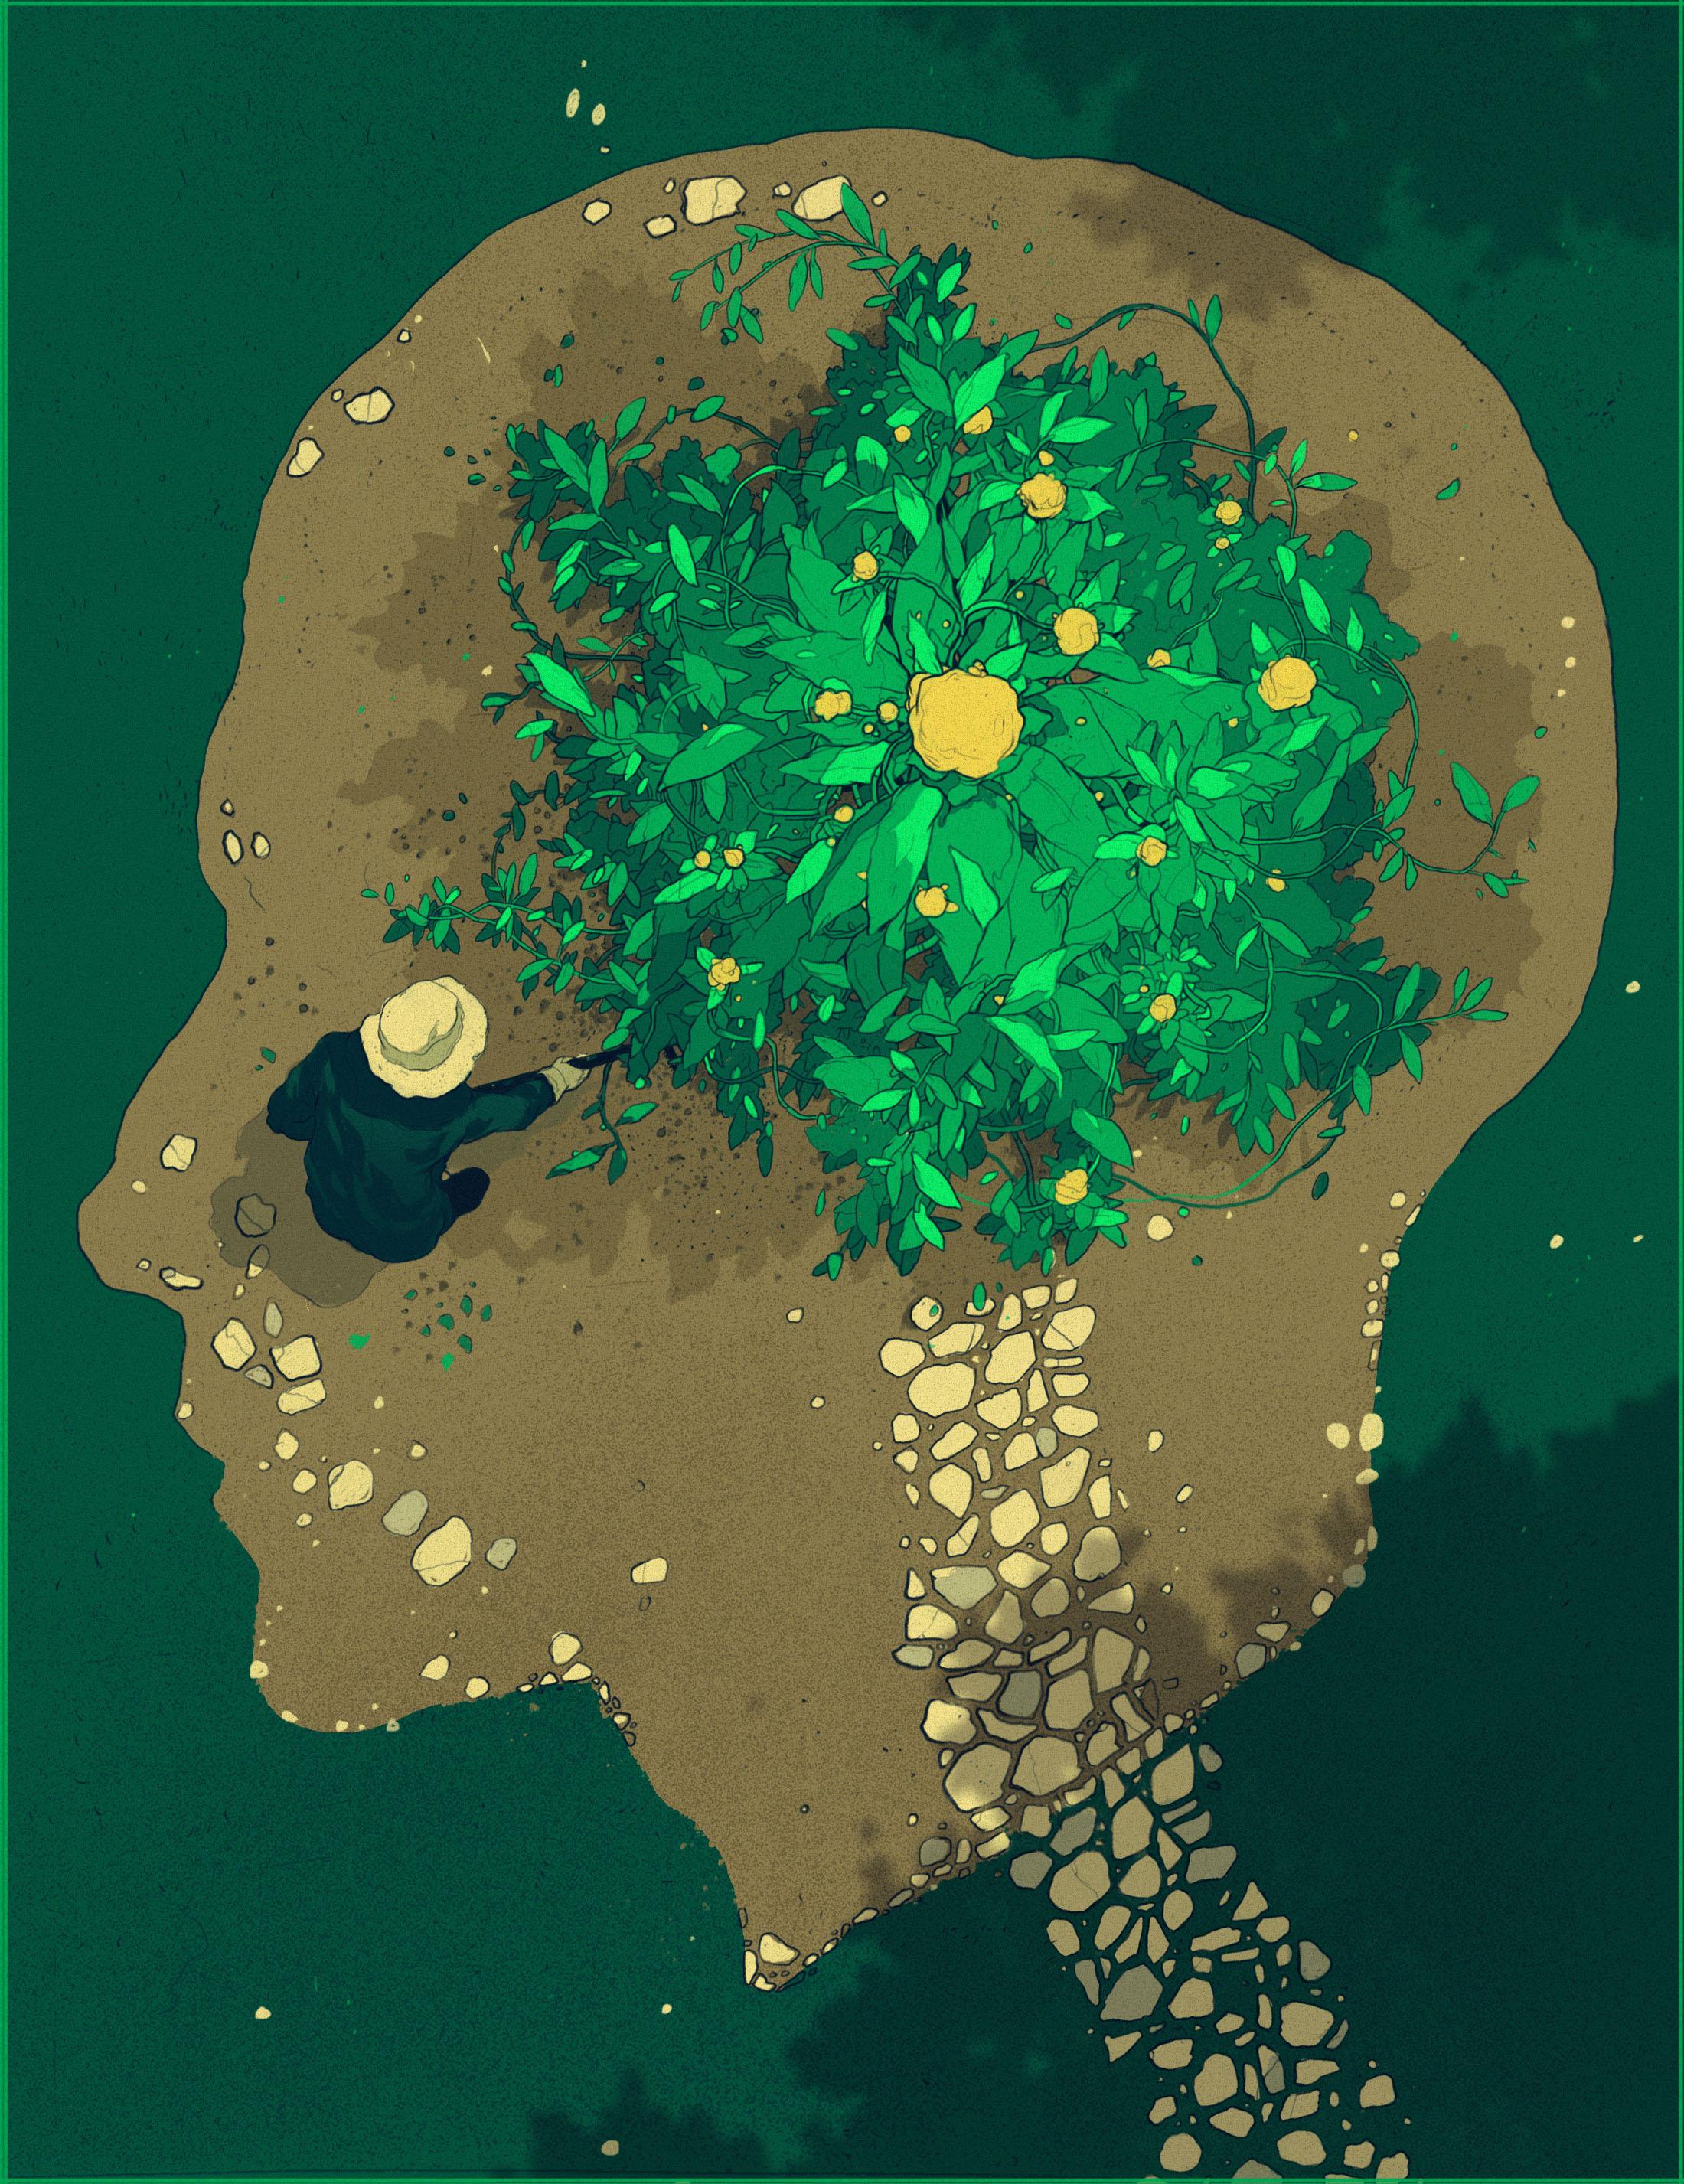 Mysterious-Illustrations-by-Simon-Prades-1.jpg